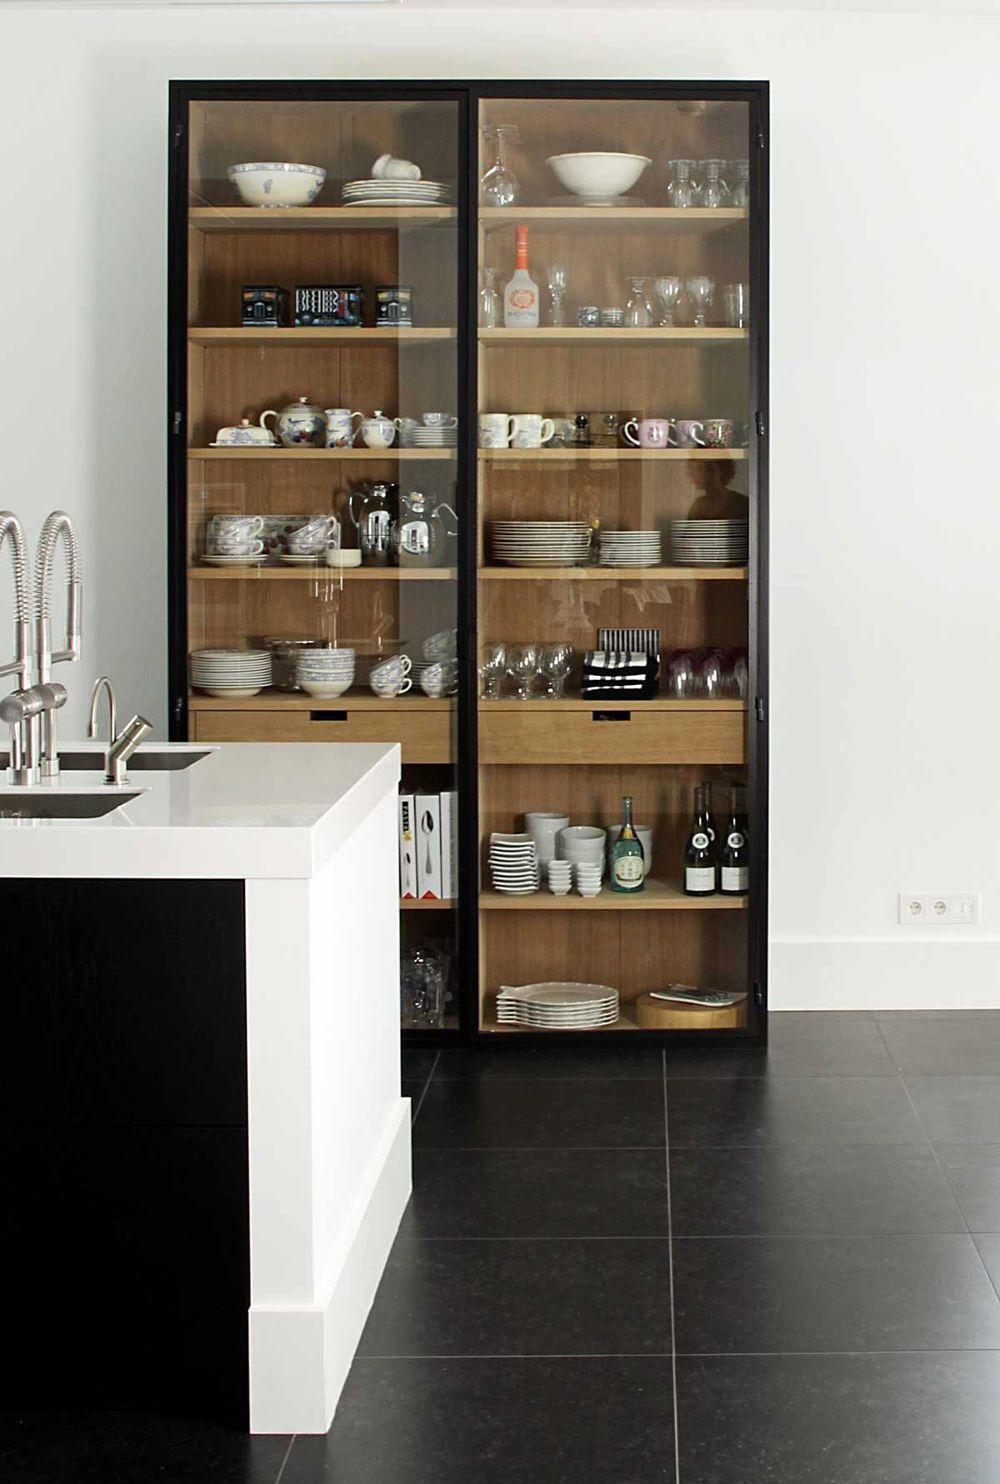 Buffet de cuisine : le rangement idéal  Buffet cuisine, Meuble